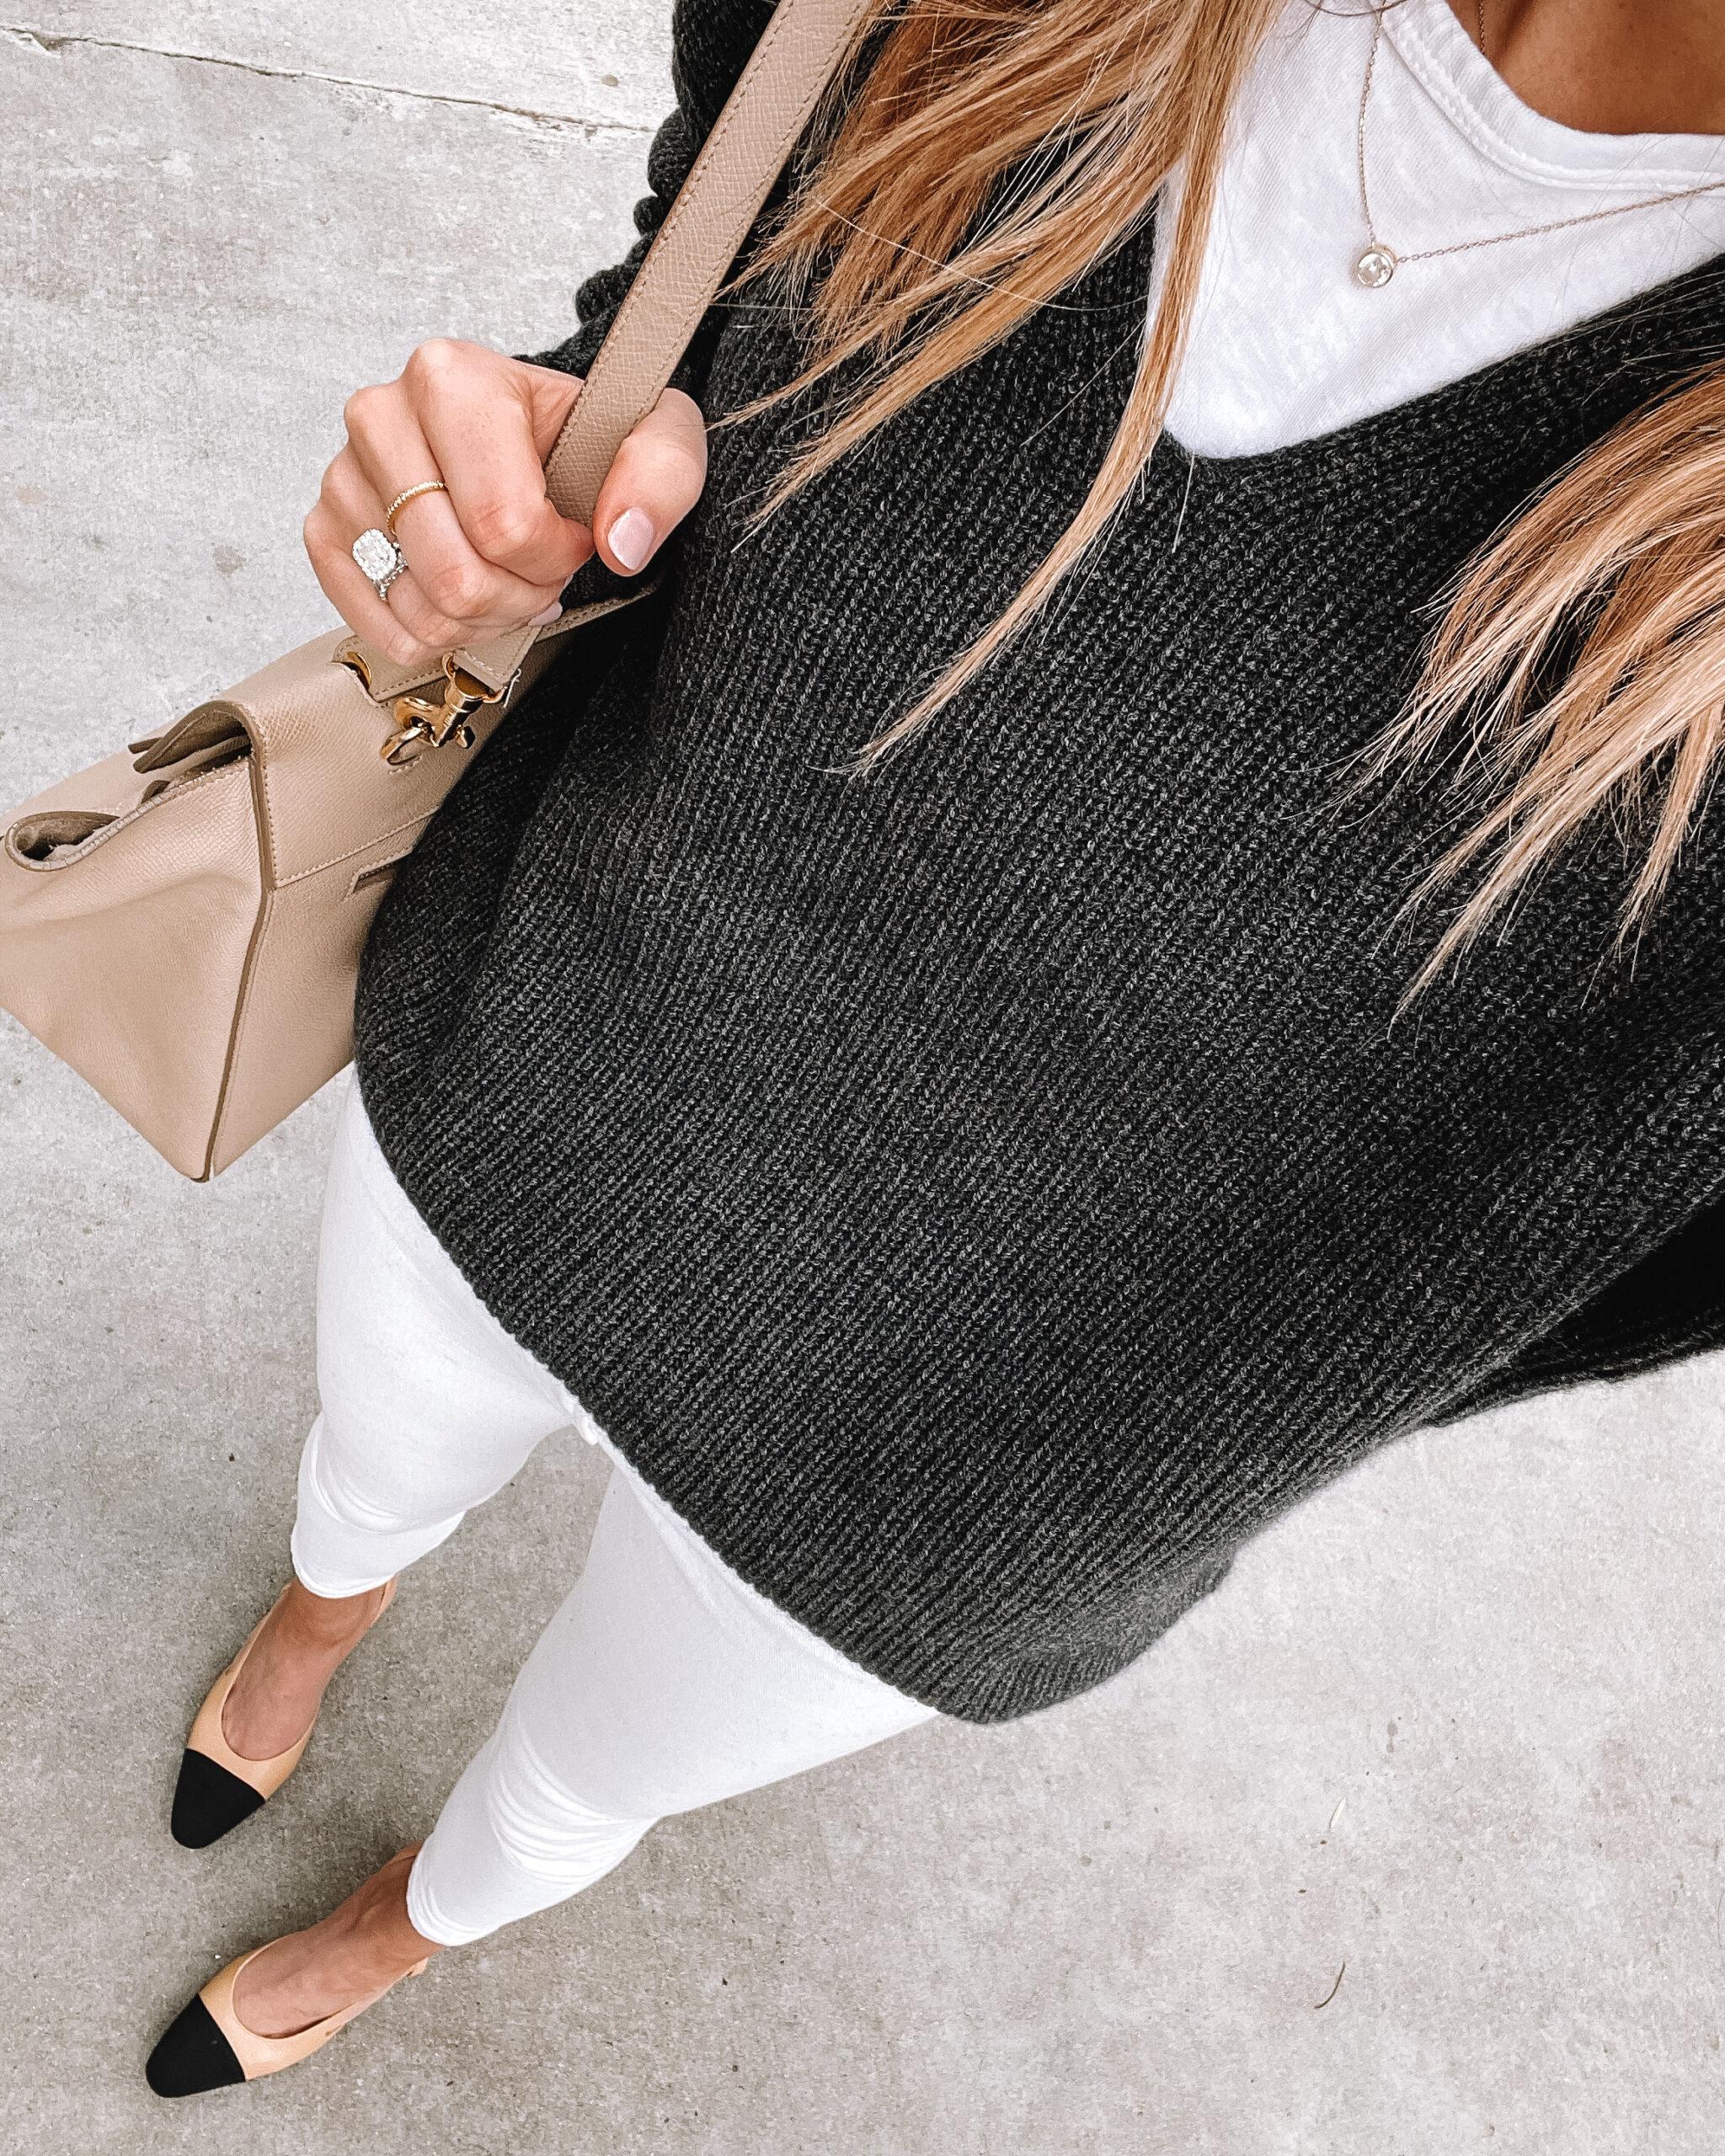 Fashion Jackson Wearing Jenni Kayne Cabin Sweater Grey White Skinny Jeans